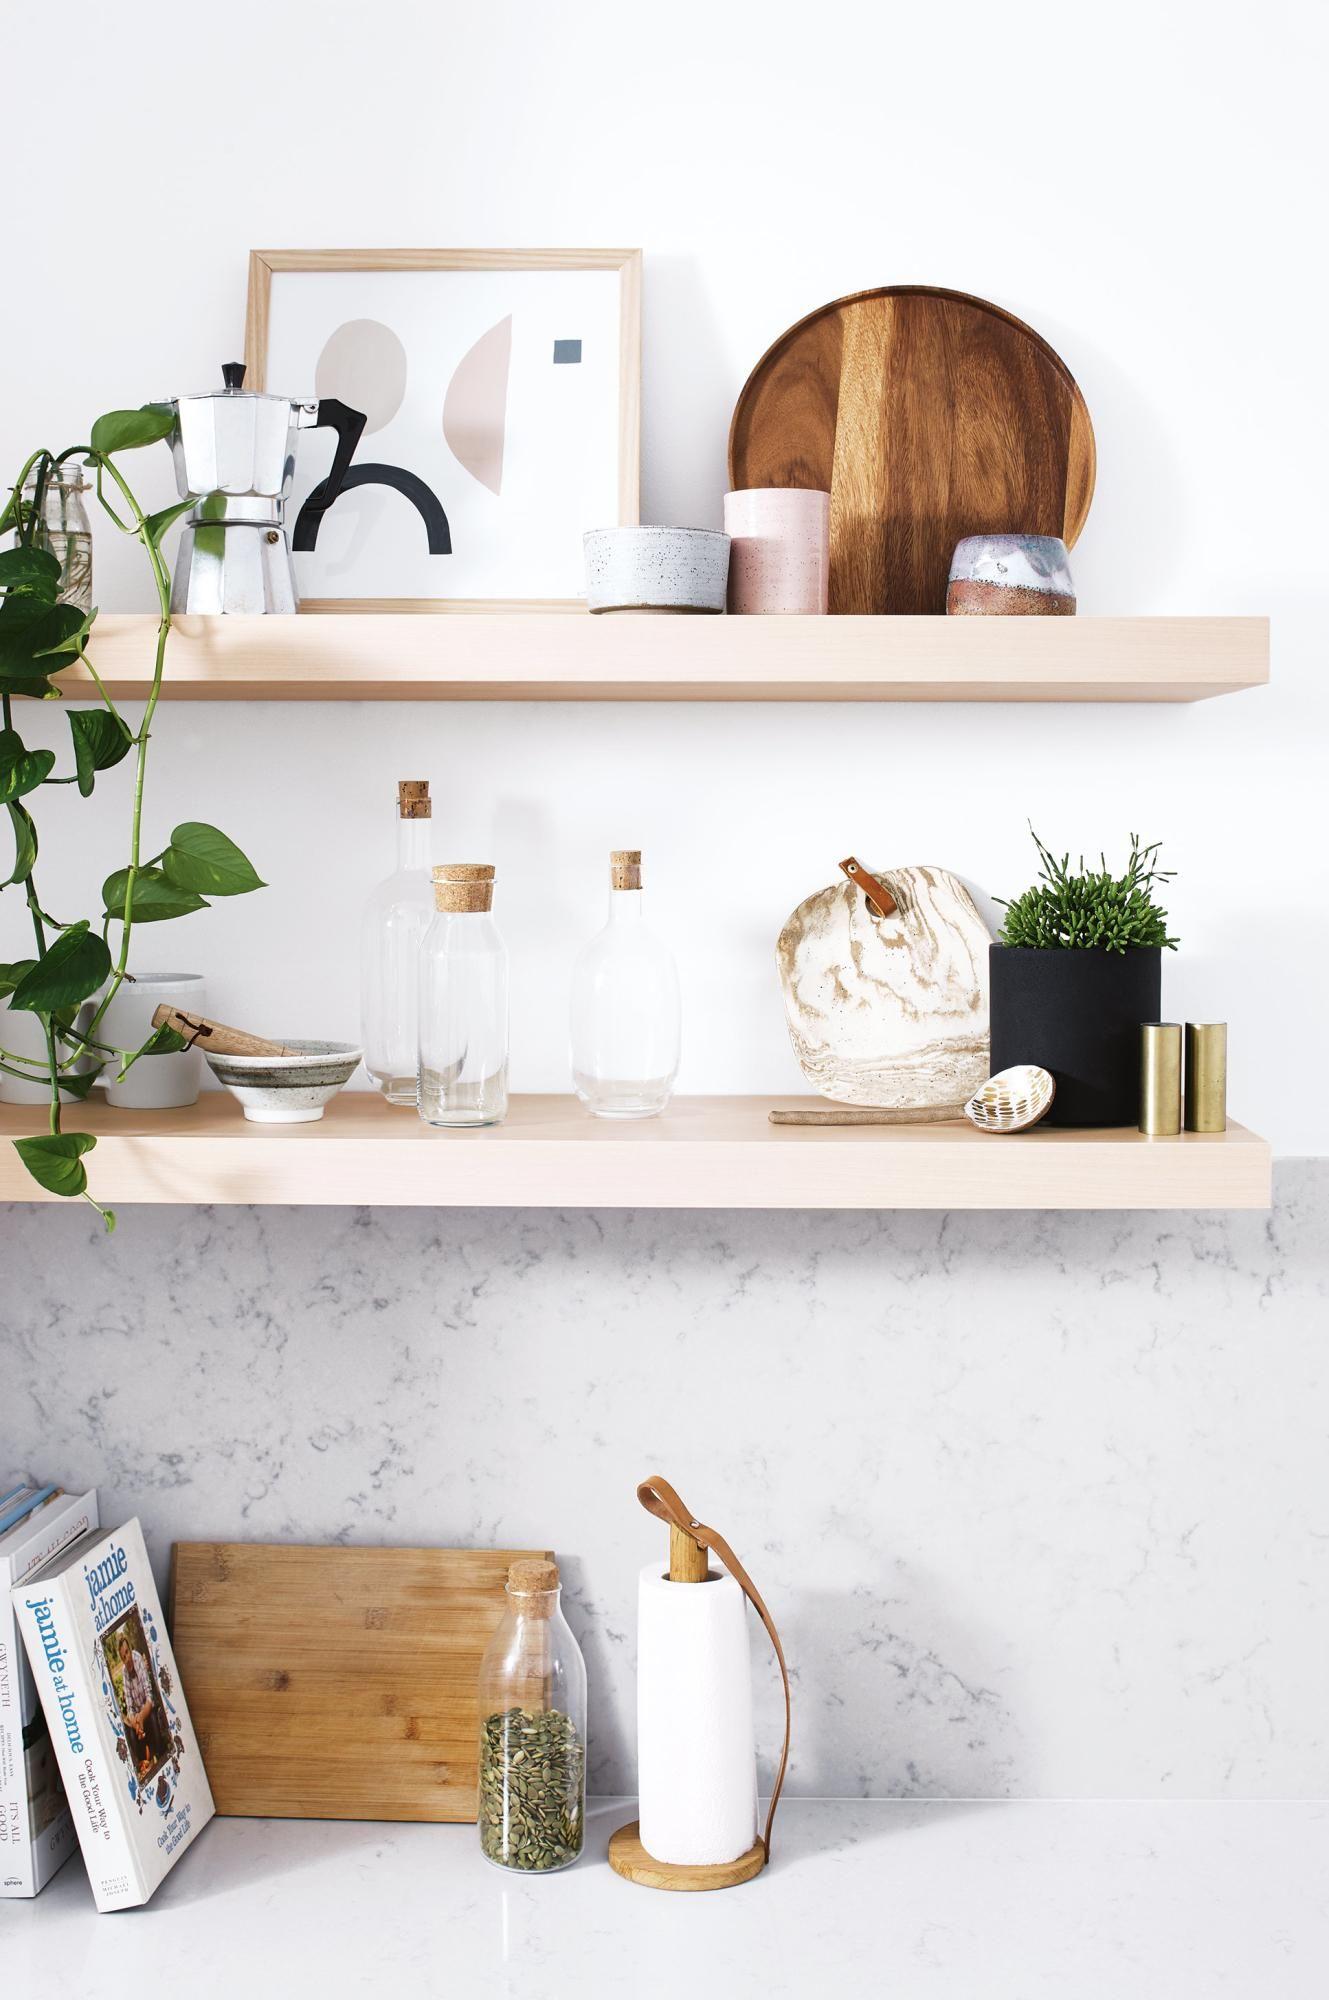 Ikea Lack Wall Shelves Mit Bildern Ikea Lack Wandregal